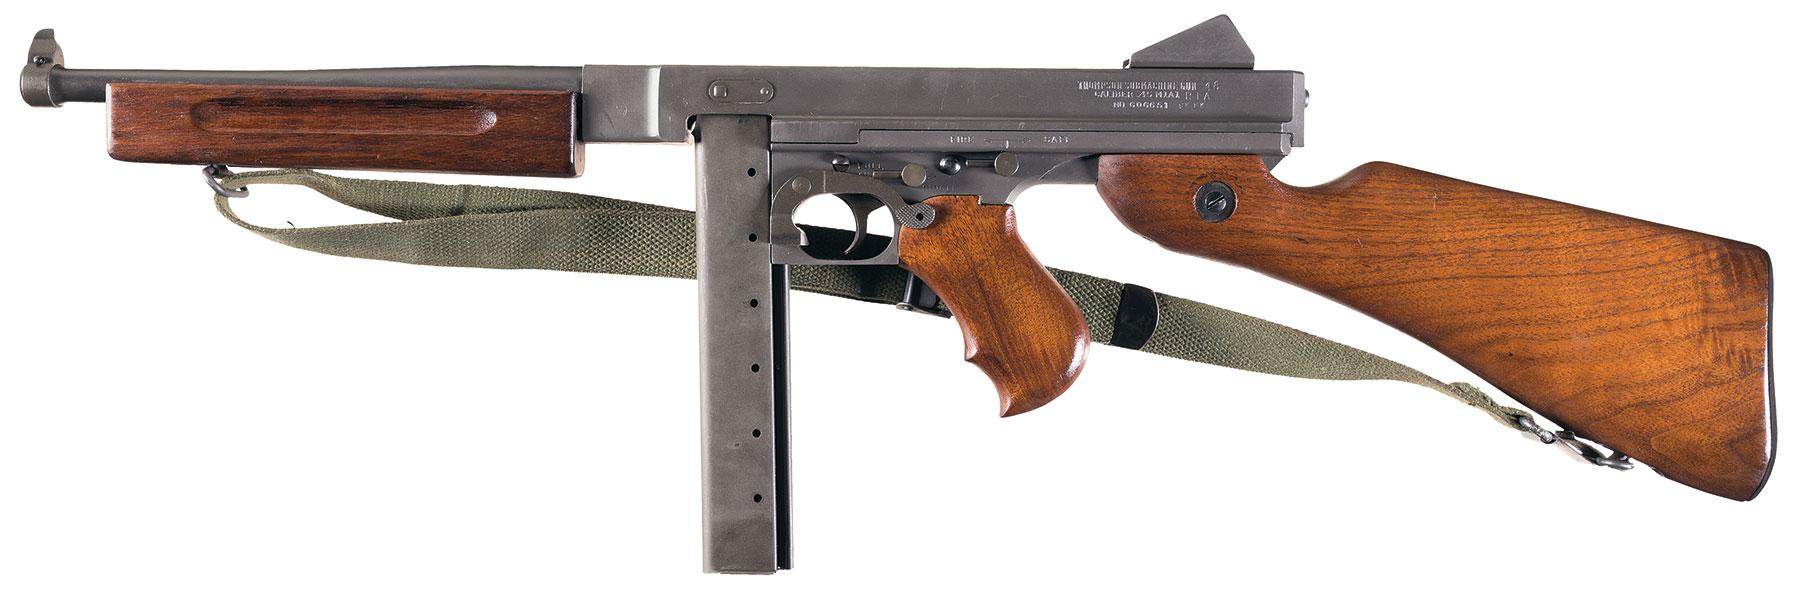 Auto Ordnance Corp - Thompson M1A1